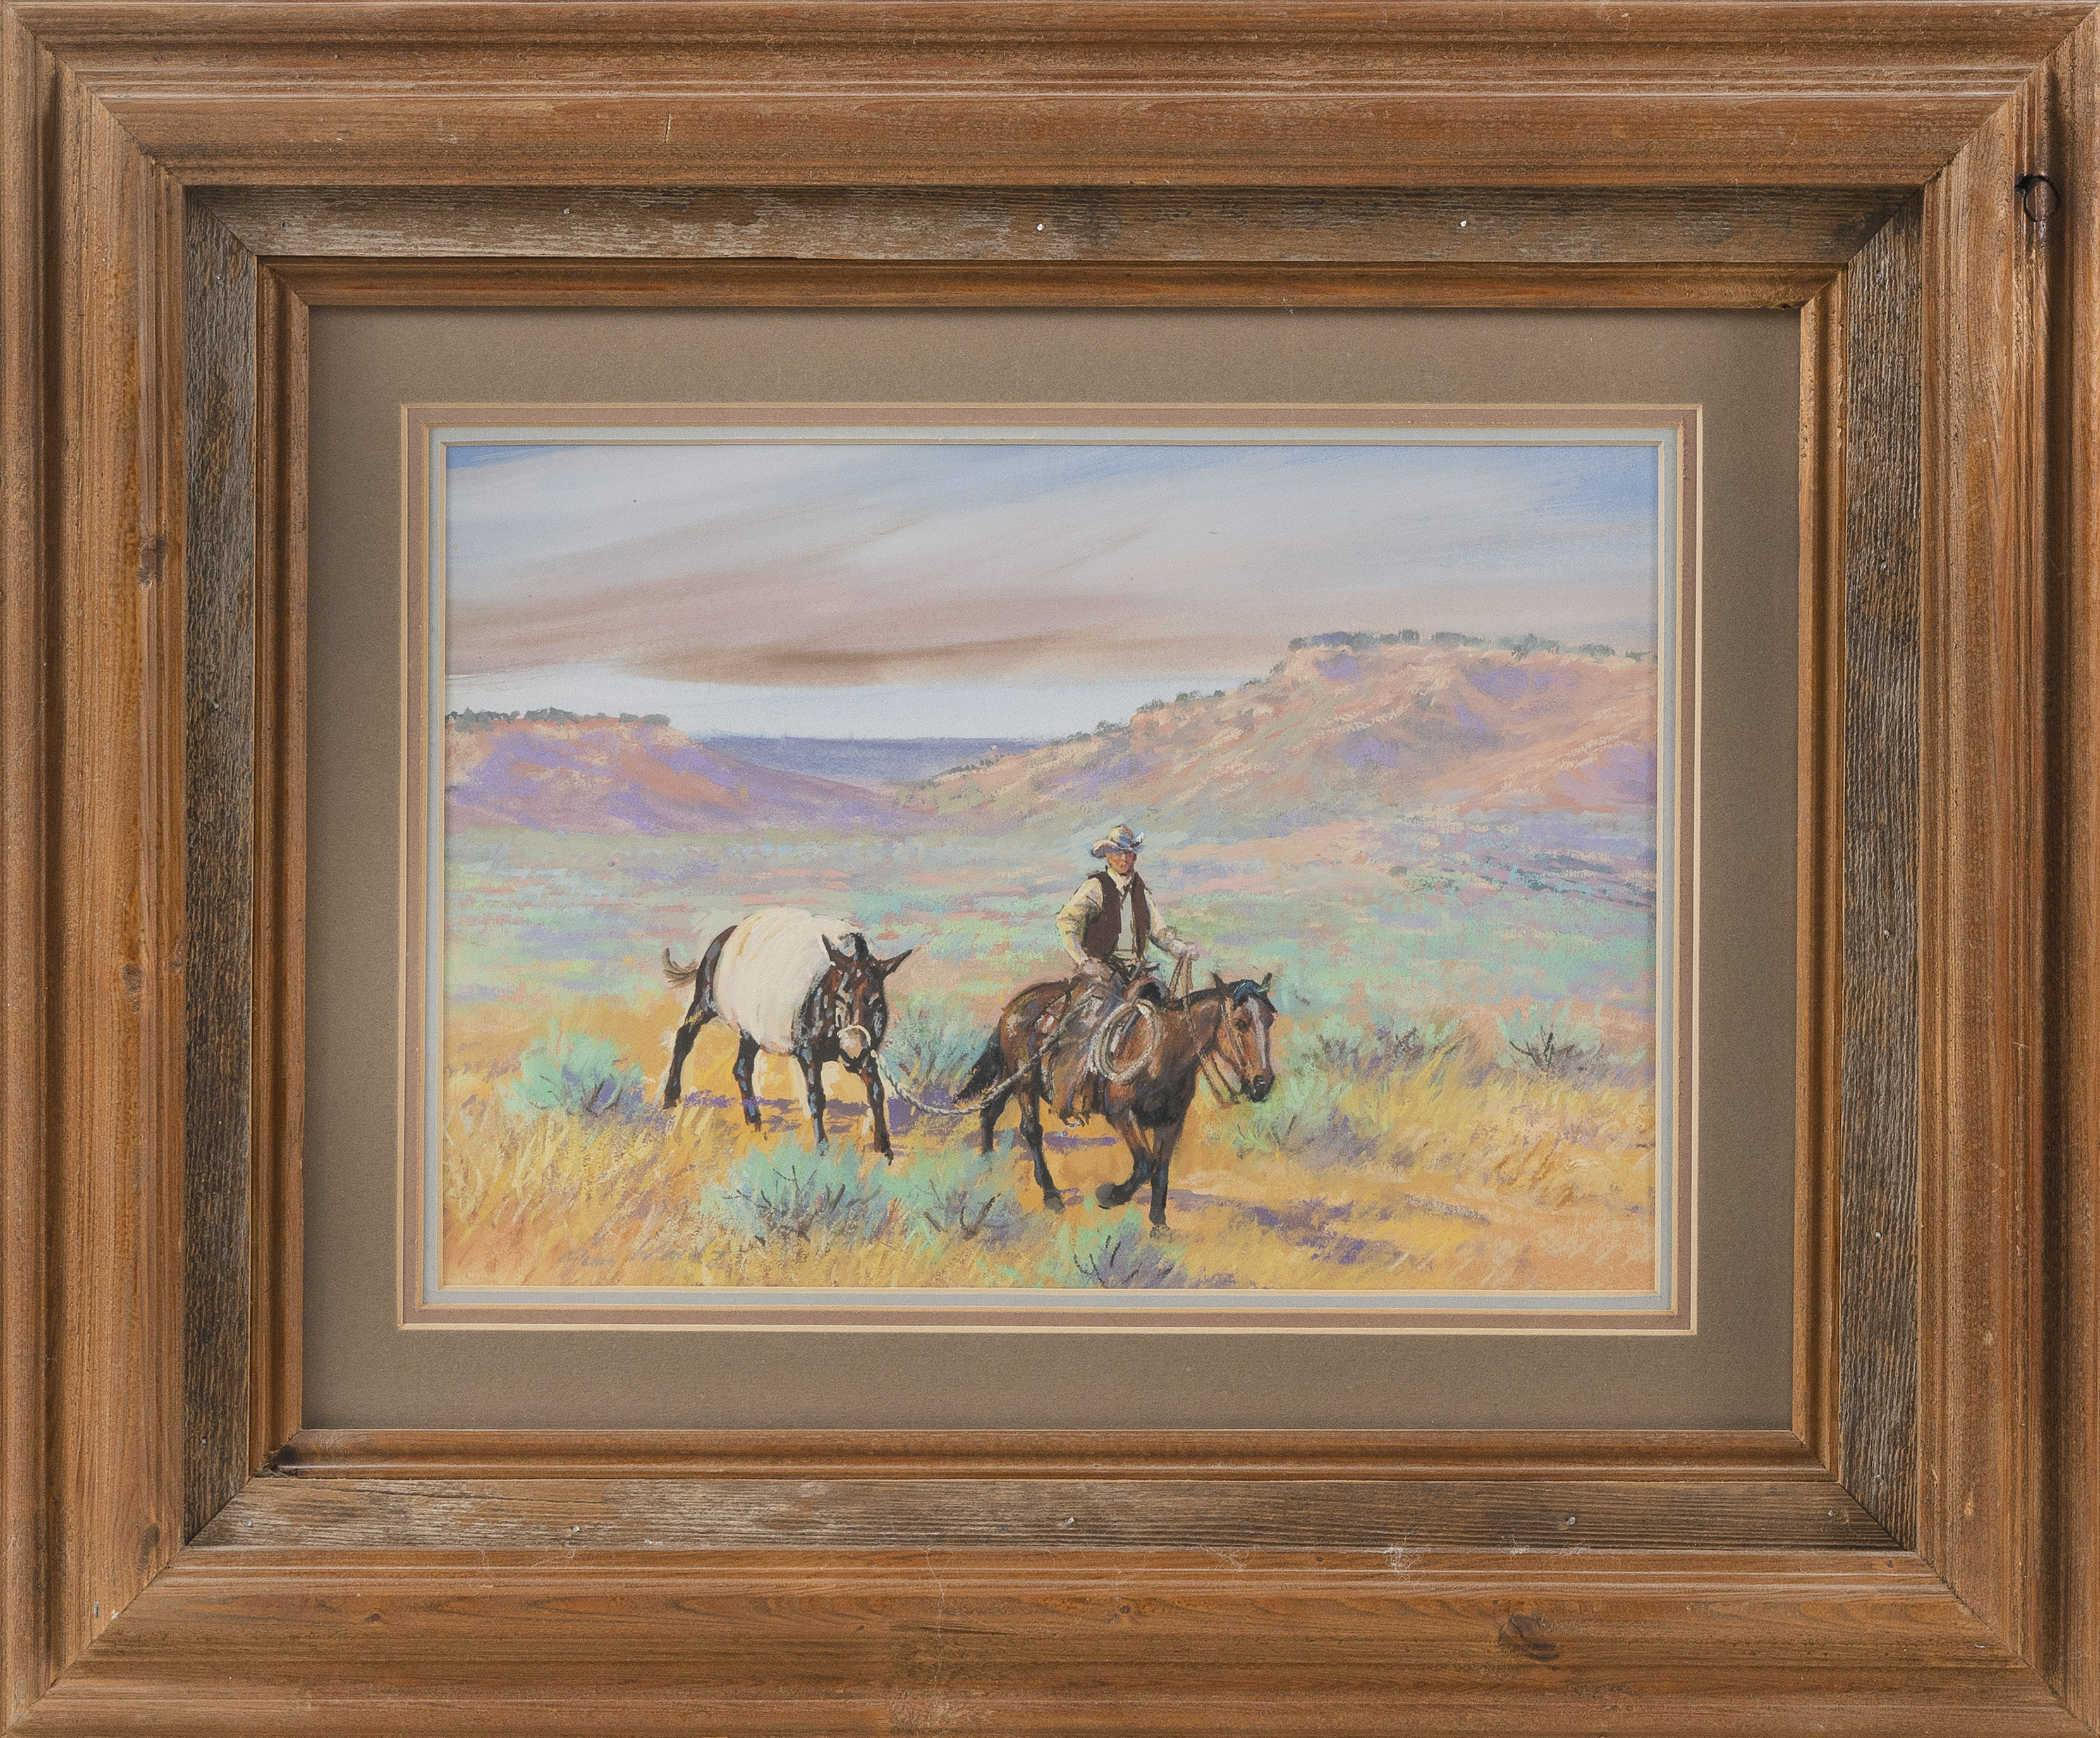 JIM (JAMES) FRANK WARD (Texas/Oklahoma, 1931-2012), Western landscape with a cowboy on horseback leading a donkey., Pastel, 8.5